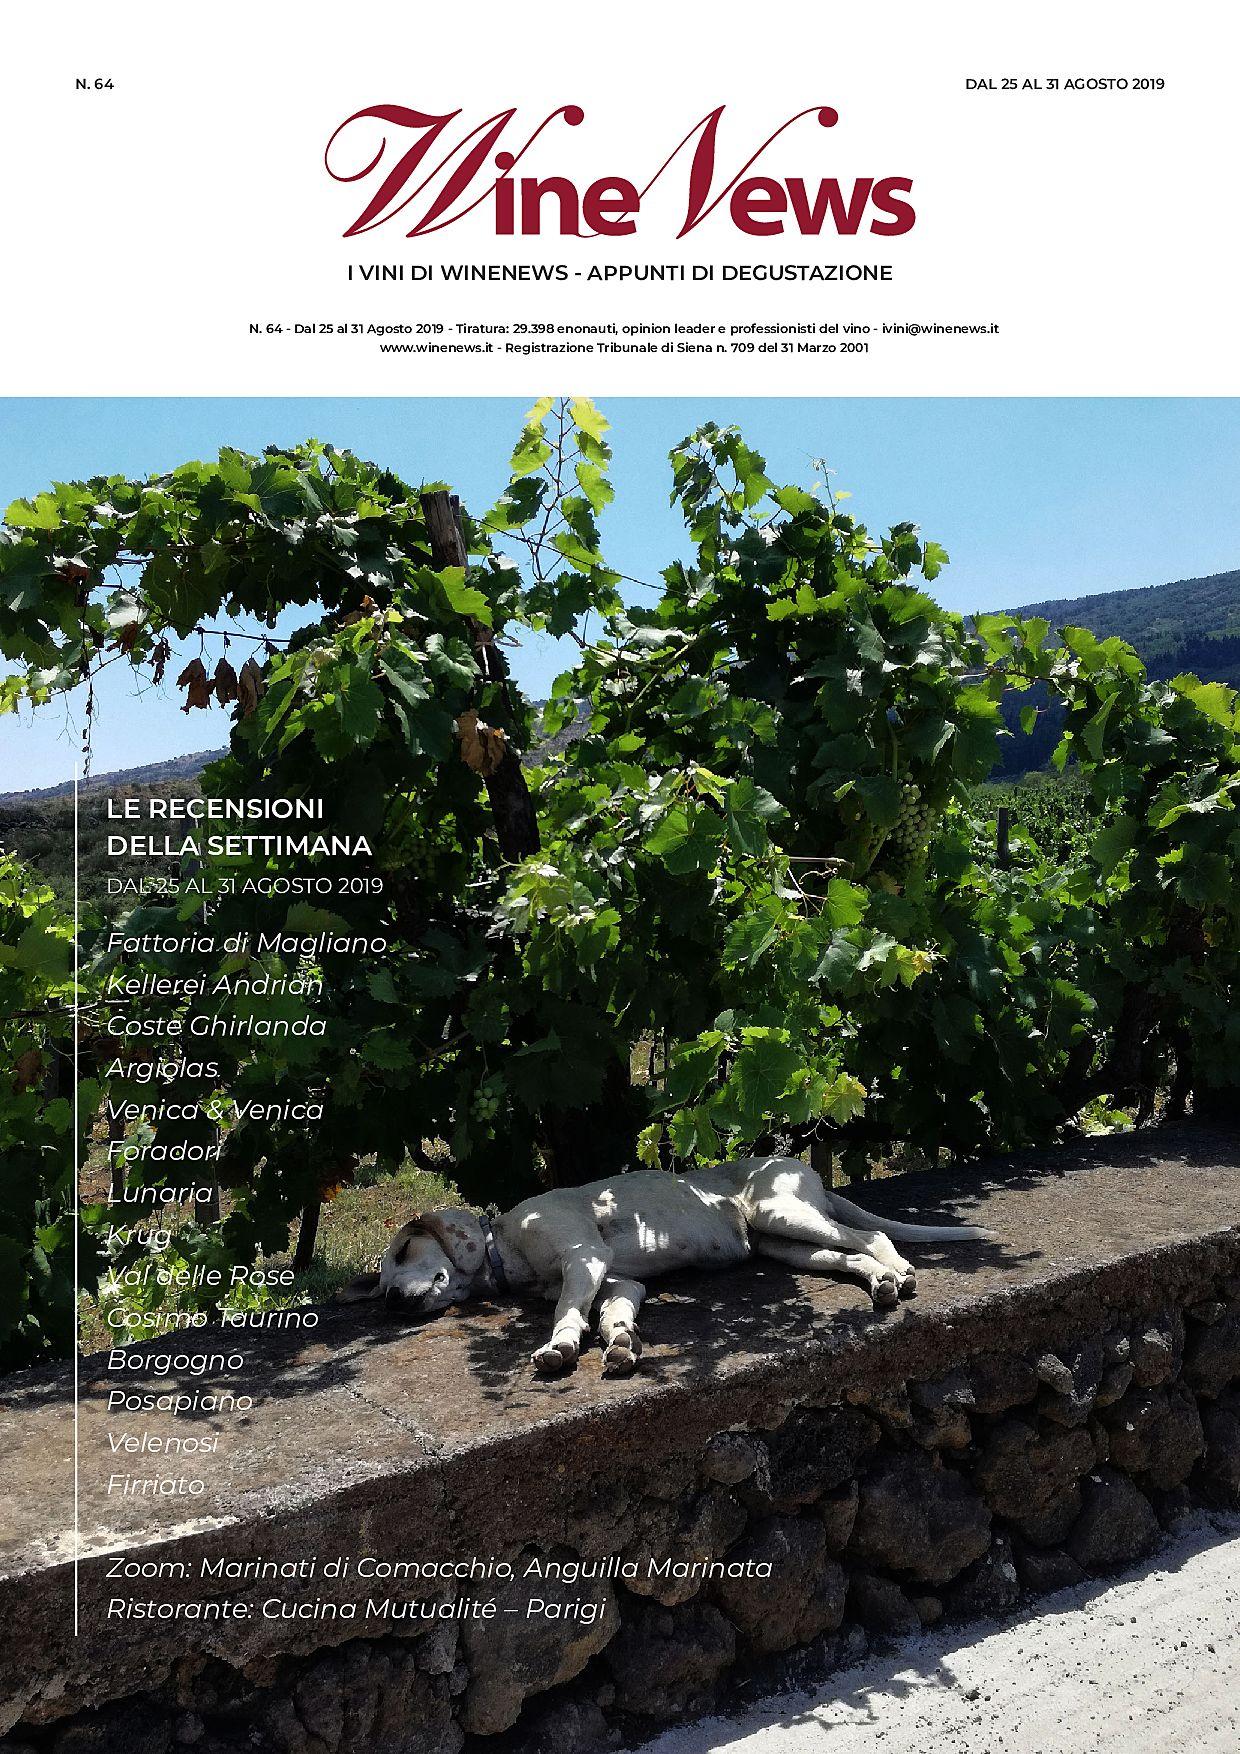 https://winenews.it/php/redirect_pdf.php?id=397657&t=1566557236